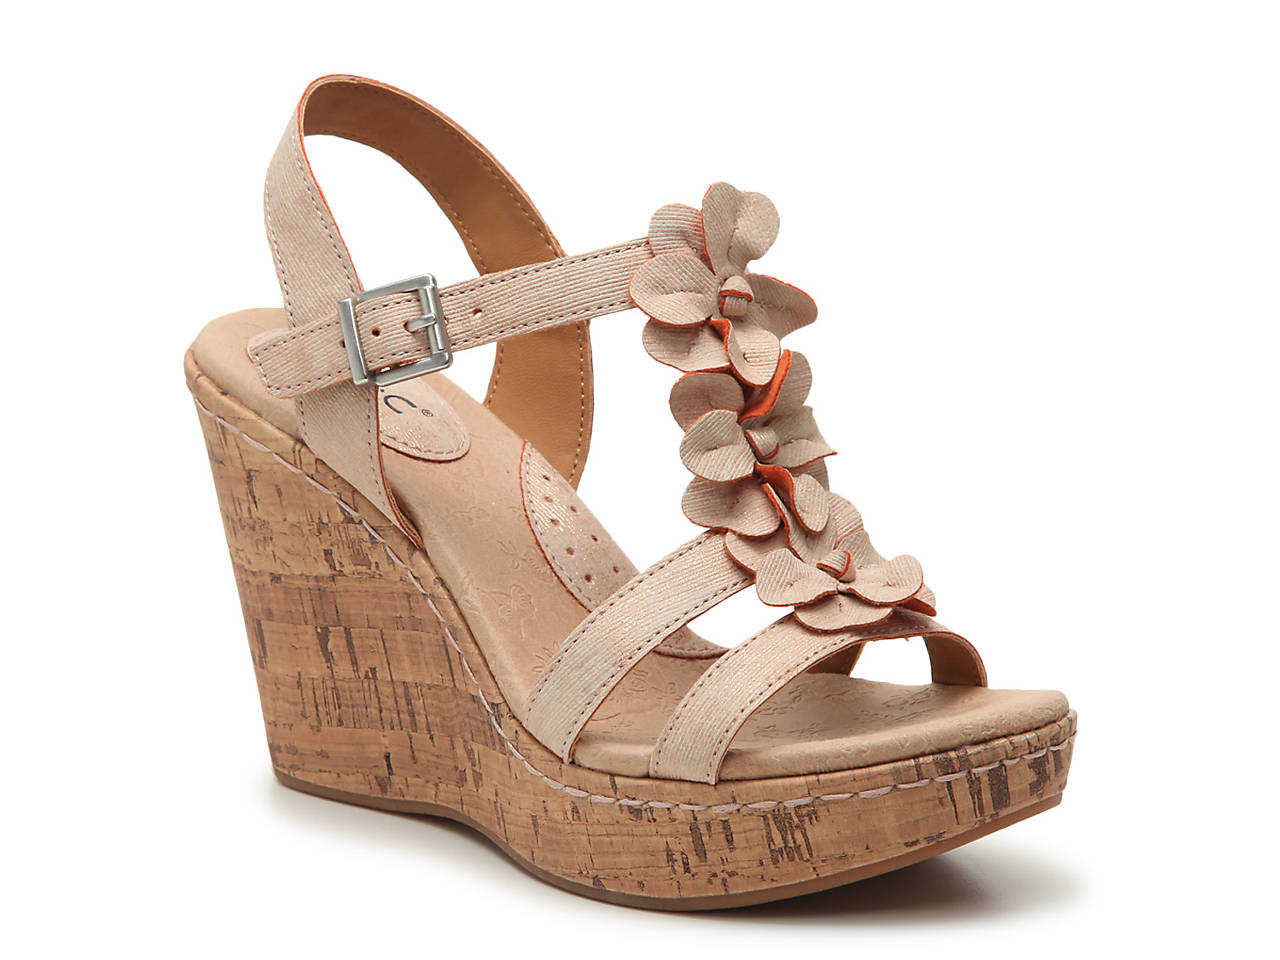 59804fc3455e b.o.c Jills Wedge Sandal Women s Shoes